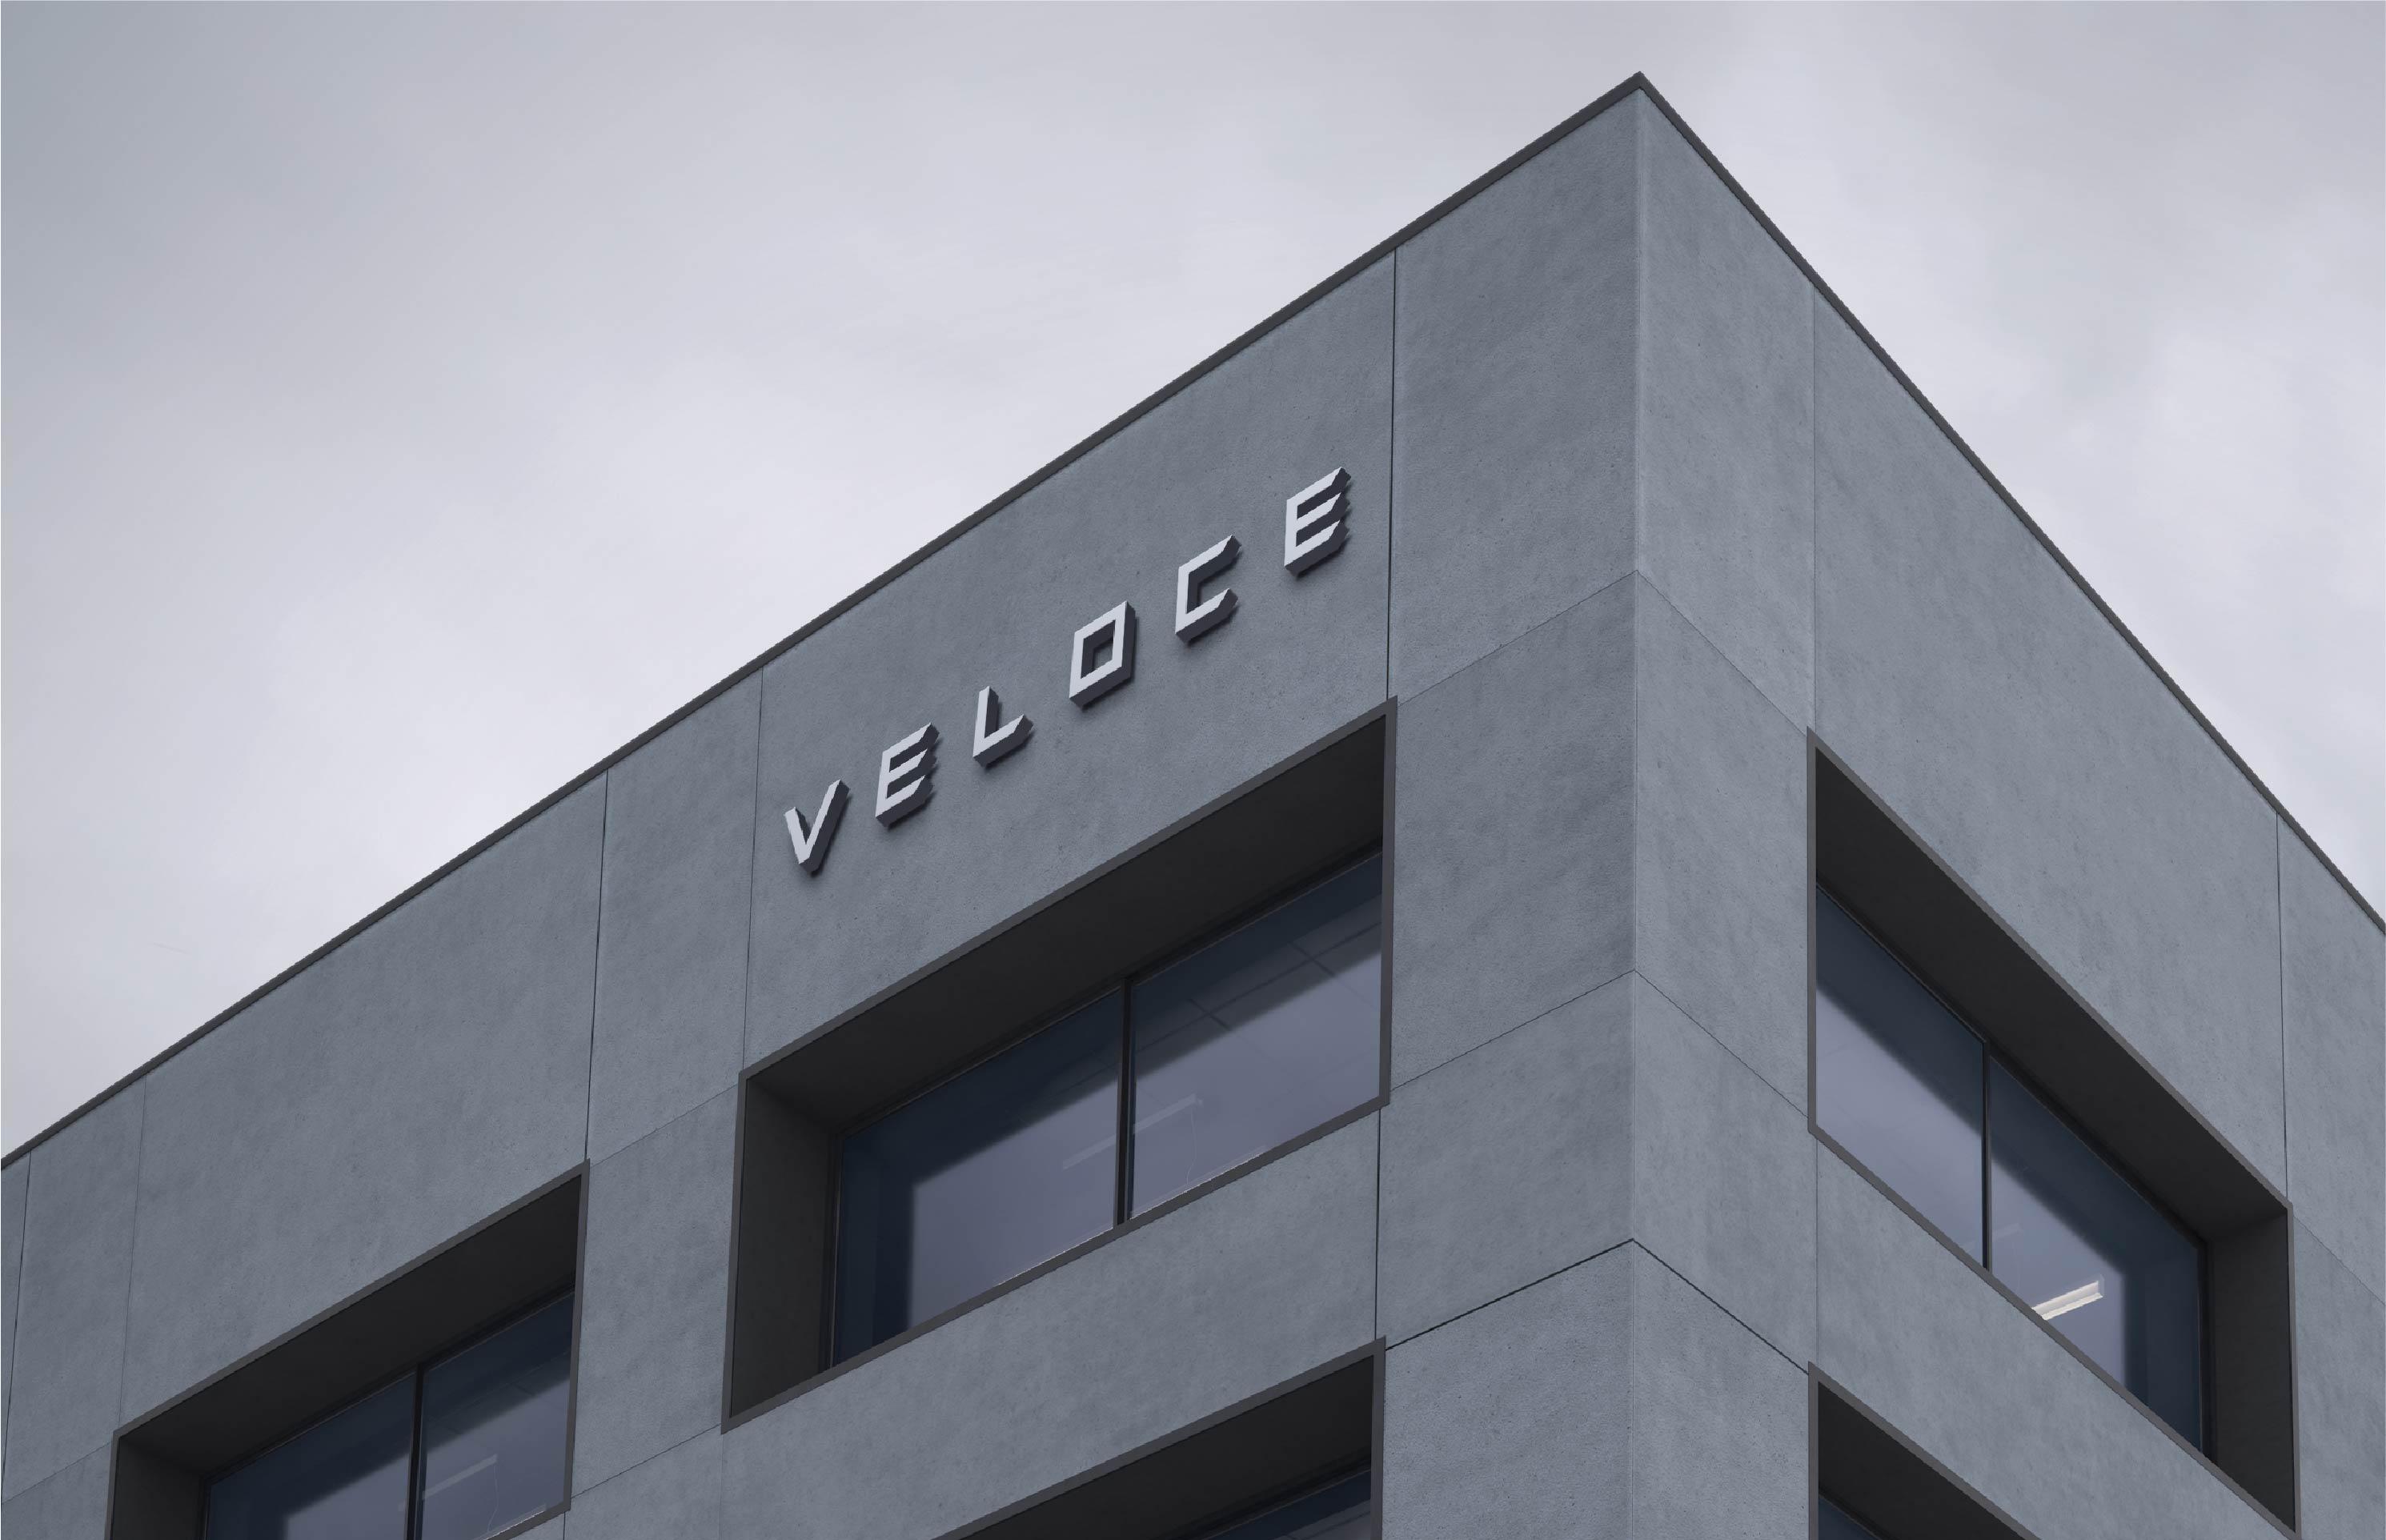 Veloce Motors Brand Identity Designed by Alexander Babariko